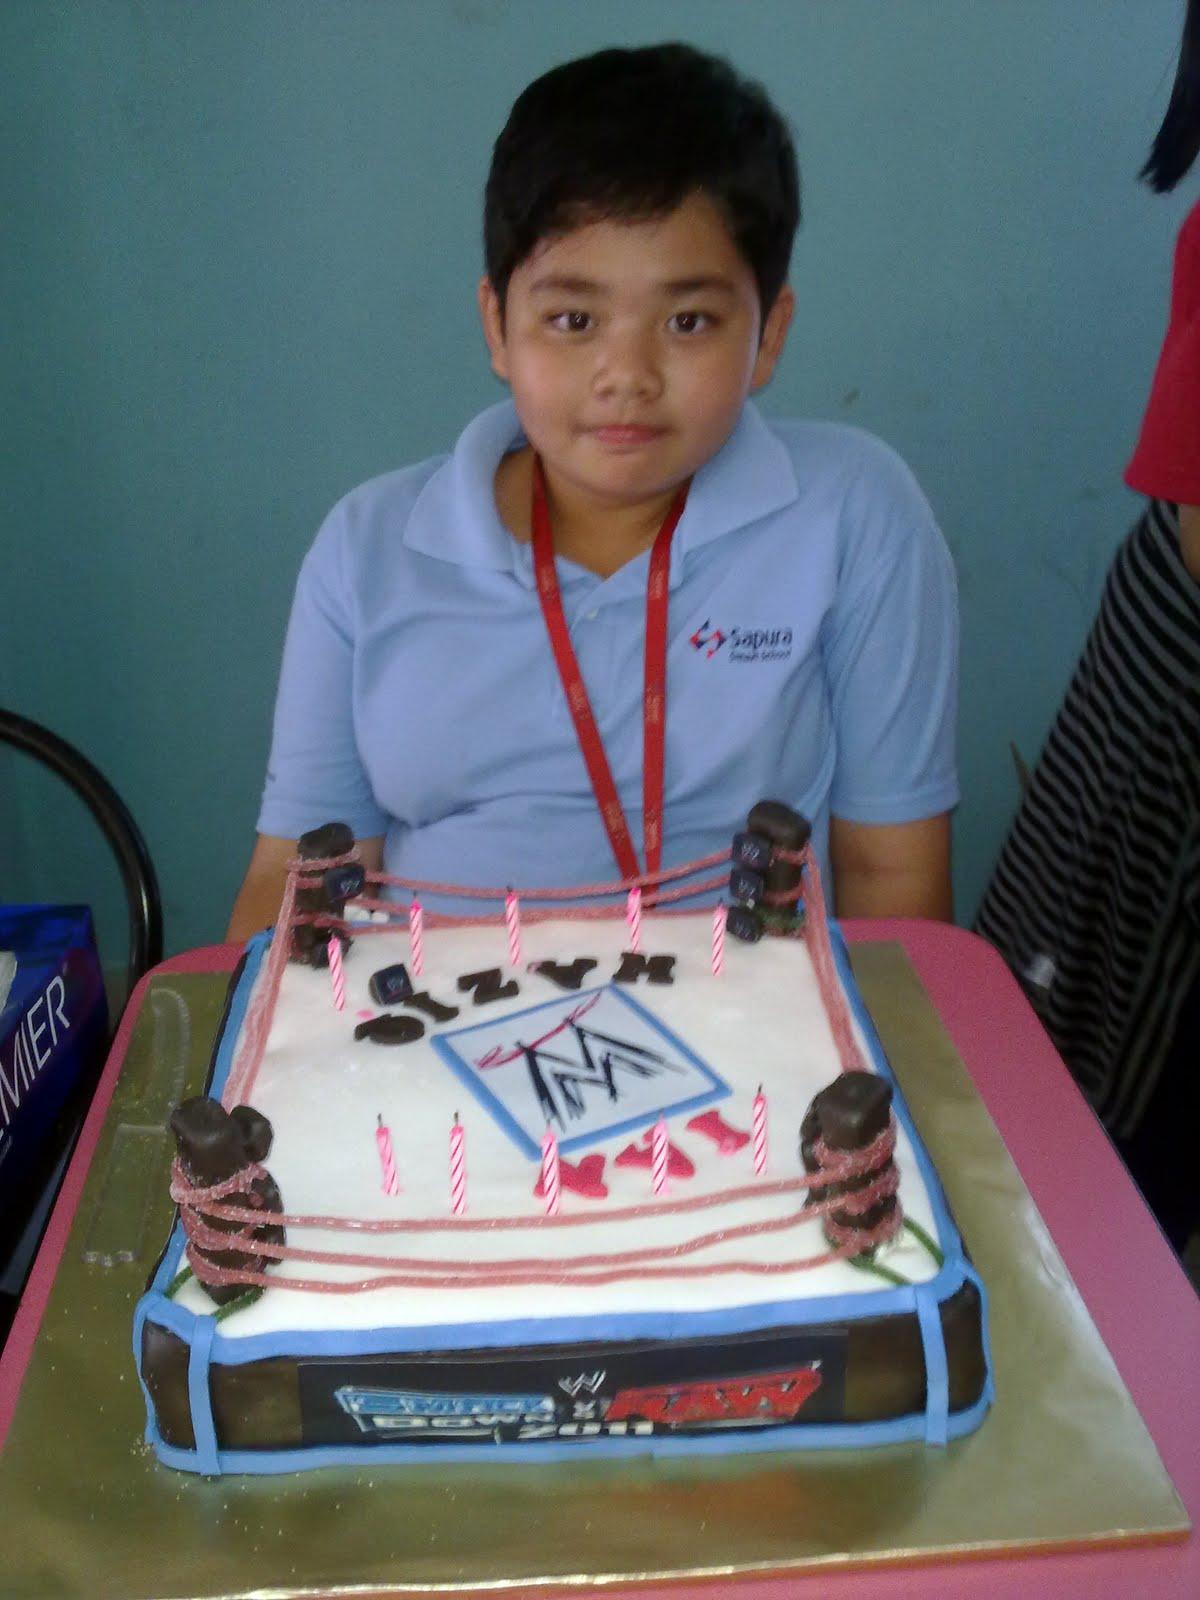 Wwe Bday Cakes For Kak Jasmin Hamid My Cup Cakes Fantasy